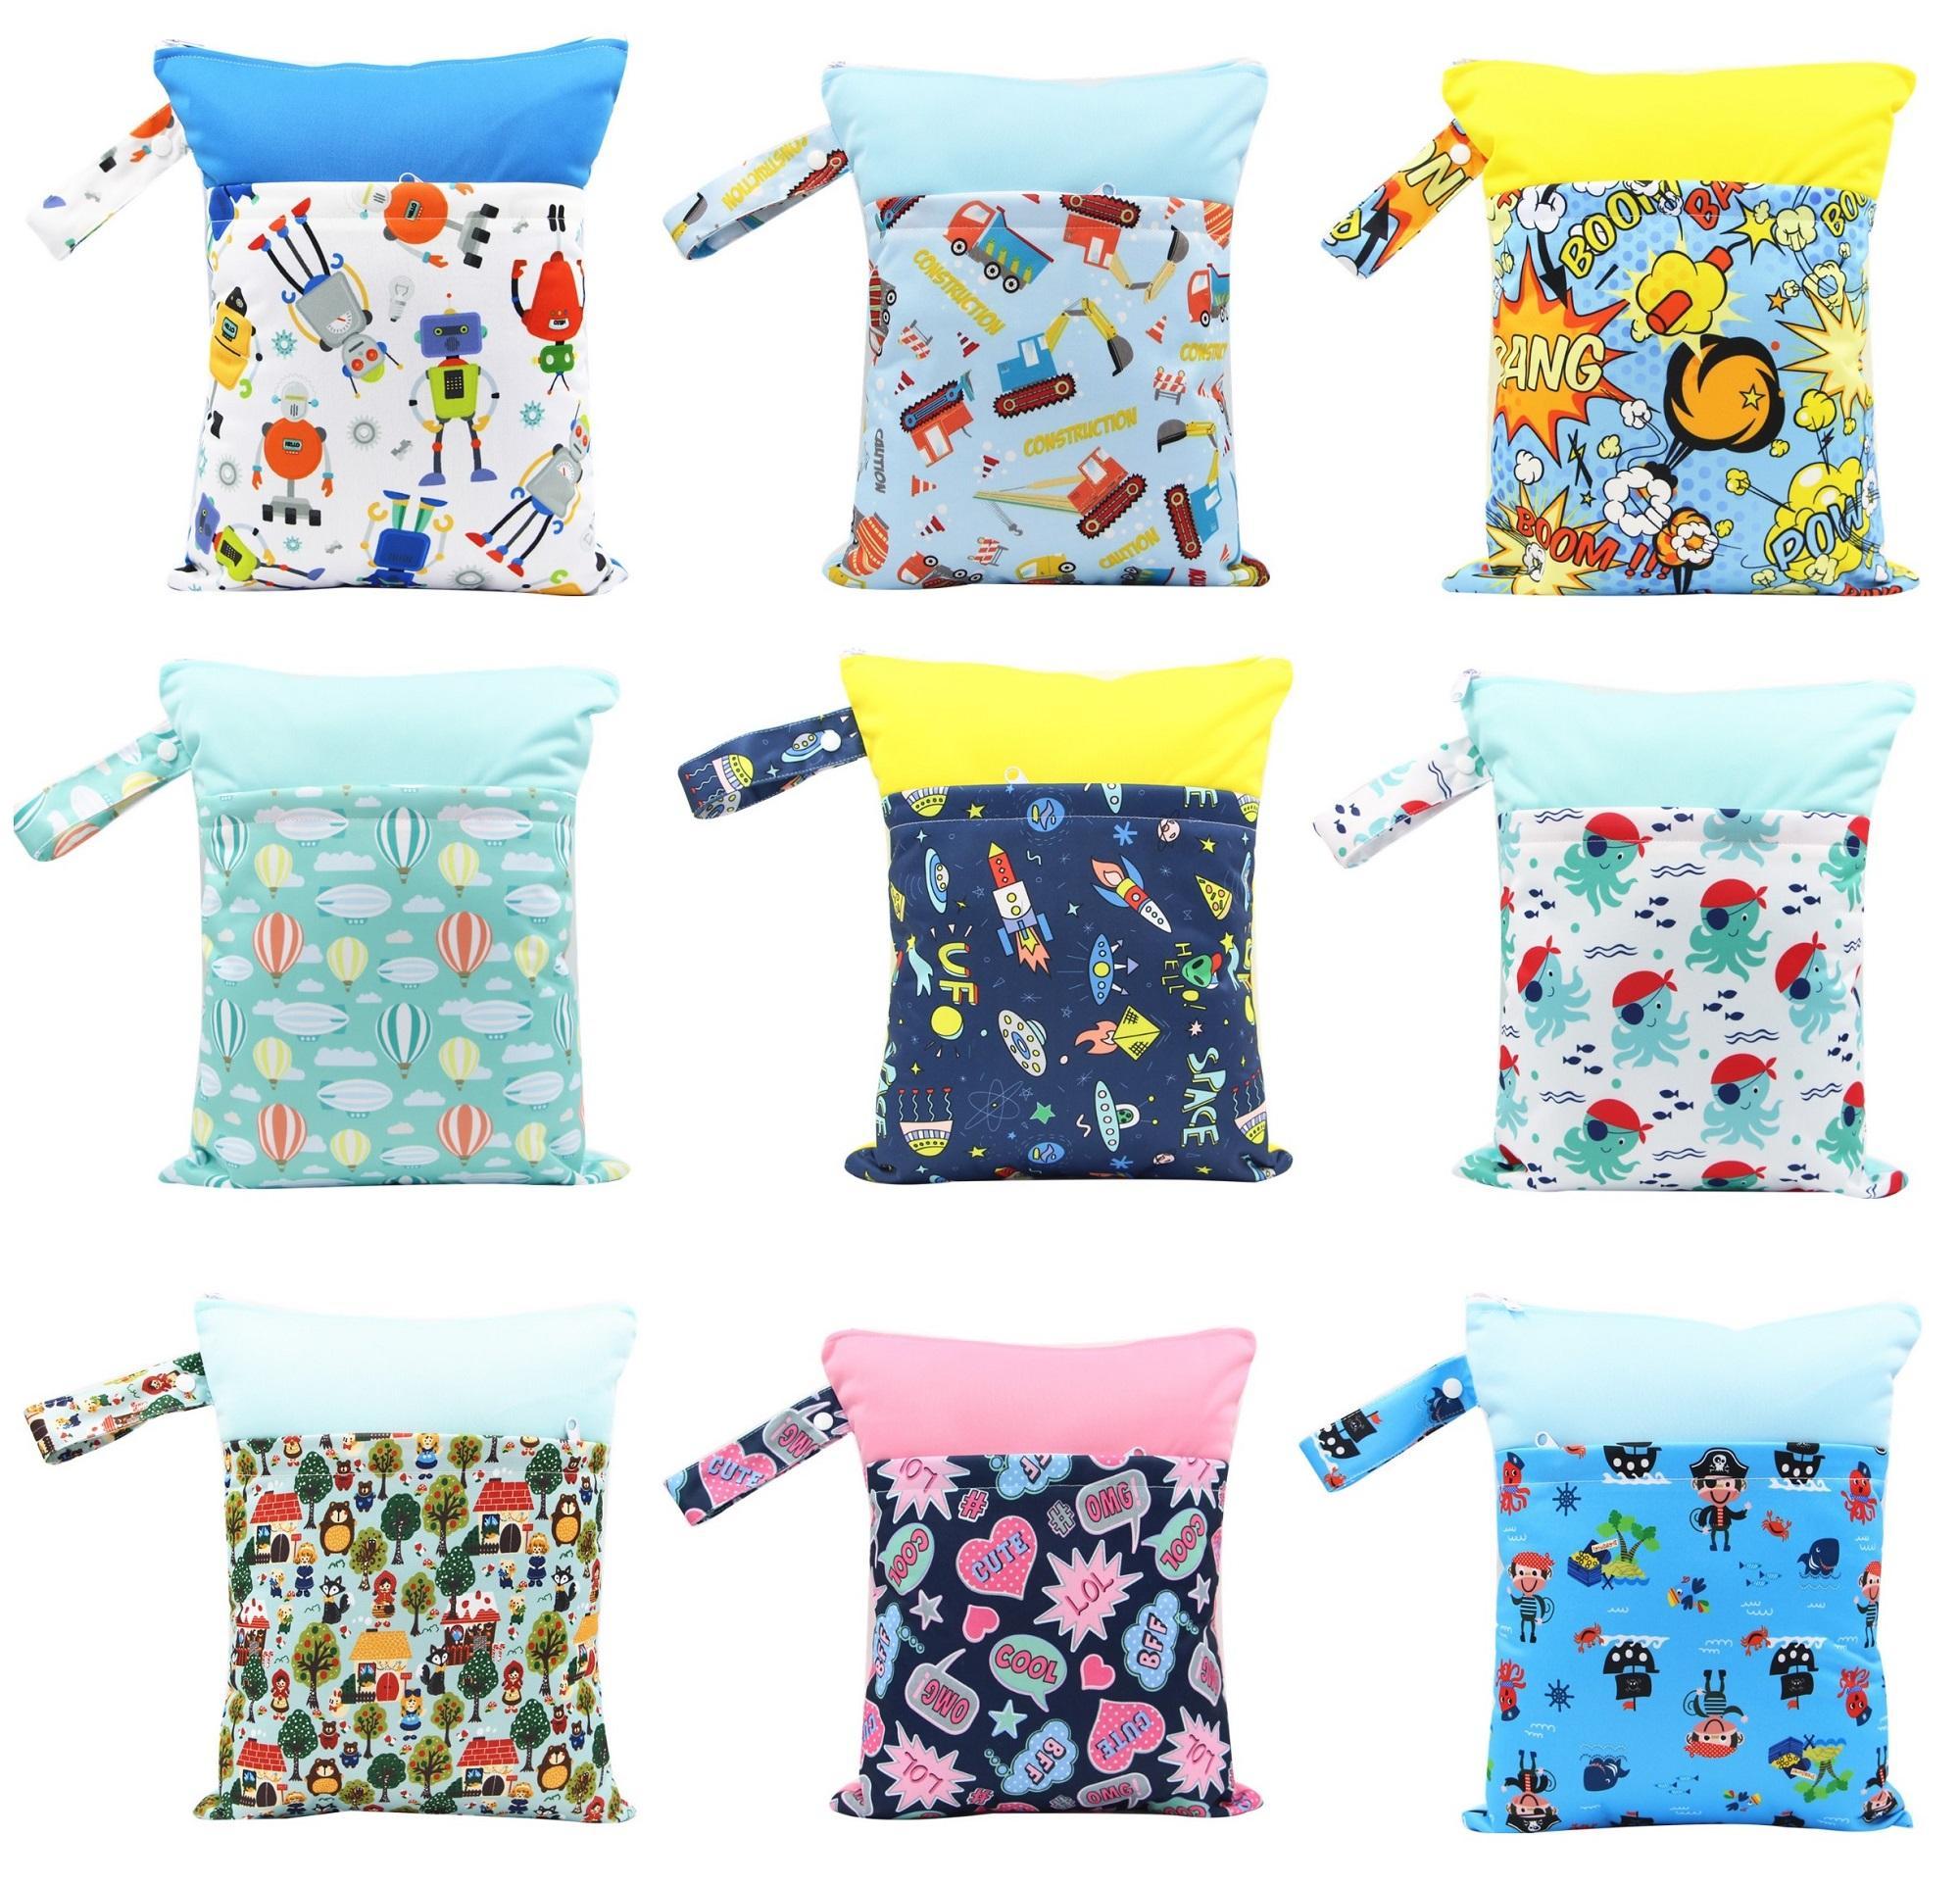 Large Size Waterproof Reusable Diaper Wetbags Swim Bag 37 Cm X 30 Cm By Little Gems.